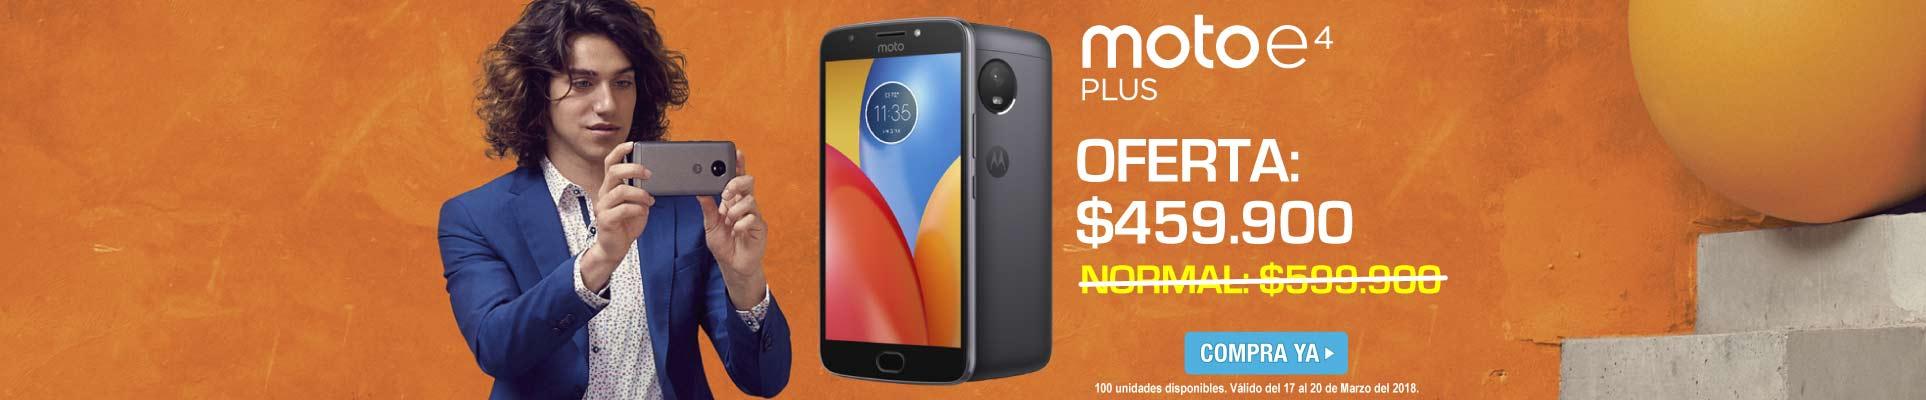 CAT ALKP-2-celulares-Celular Libre MOTOROLA Moto E4 Plus DS-prod-Marzo17-20